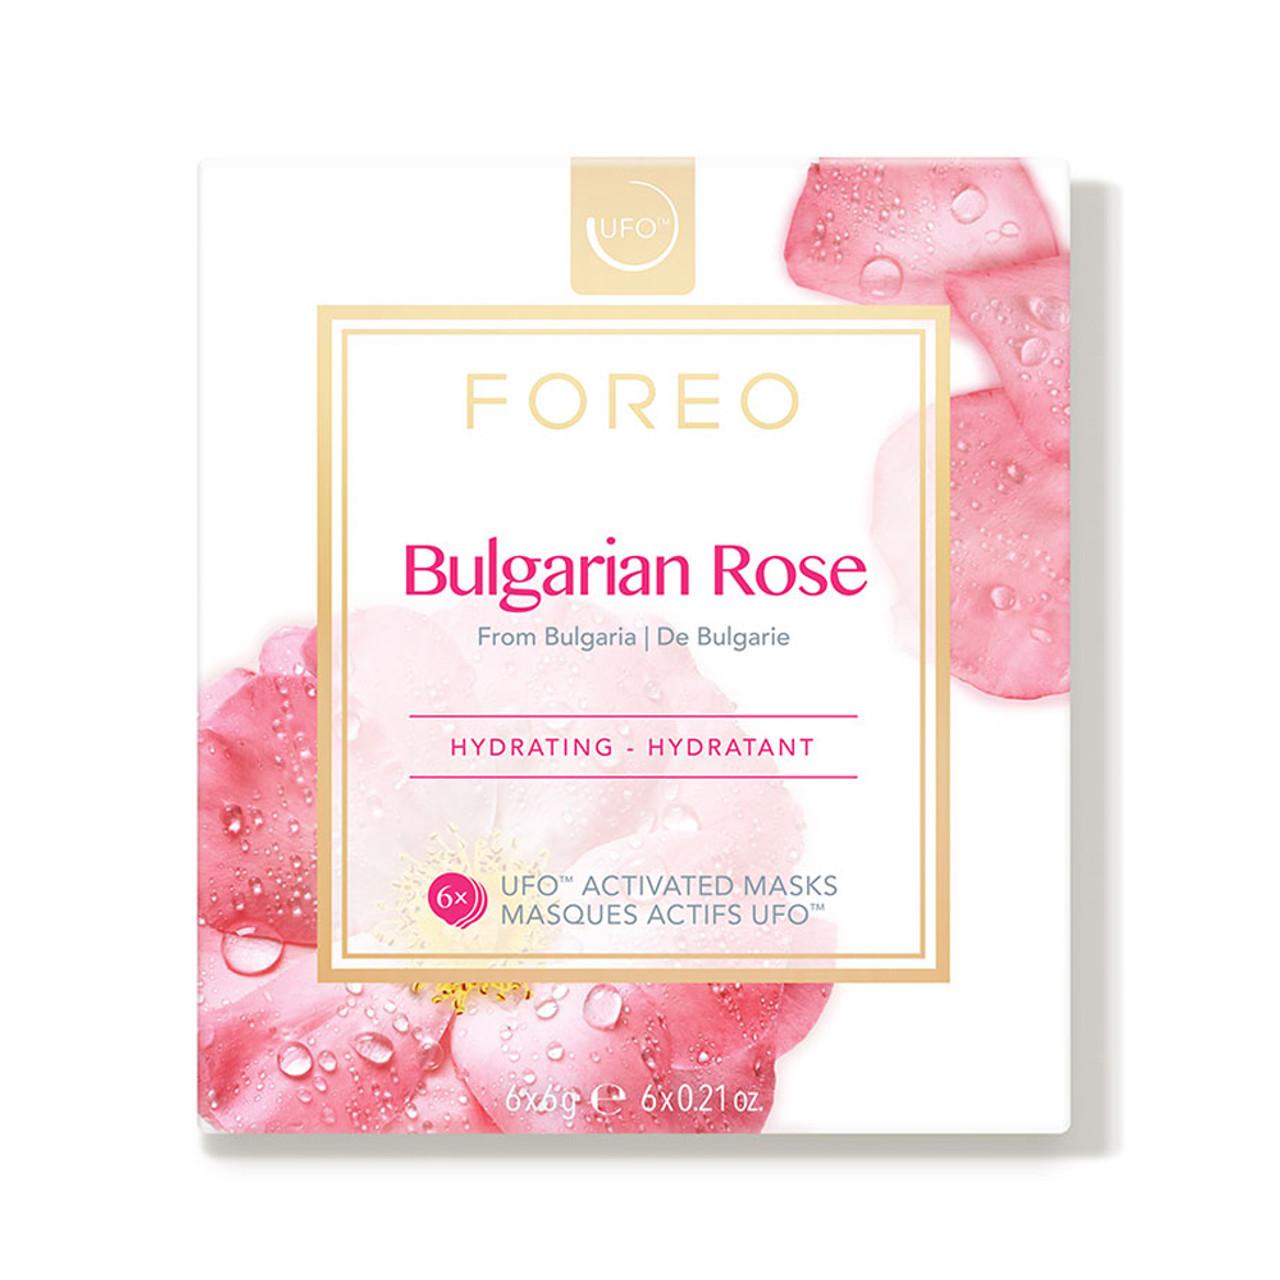 Foreo UFO Activated Masks - Bulgarian Rose (6-Pk)